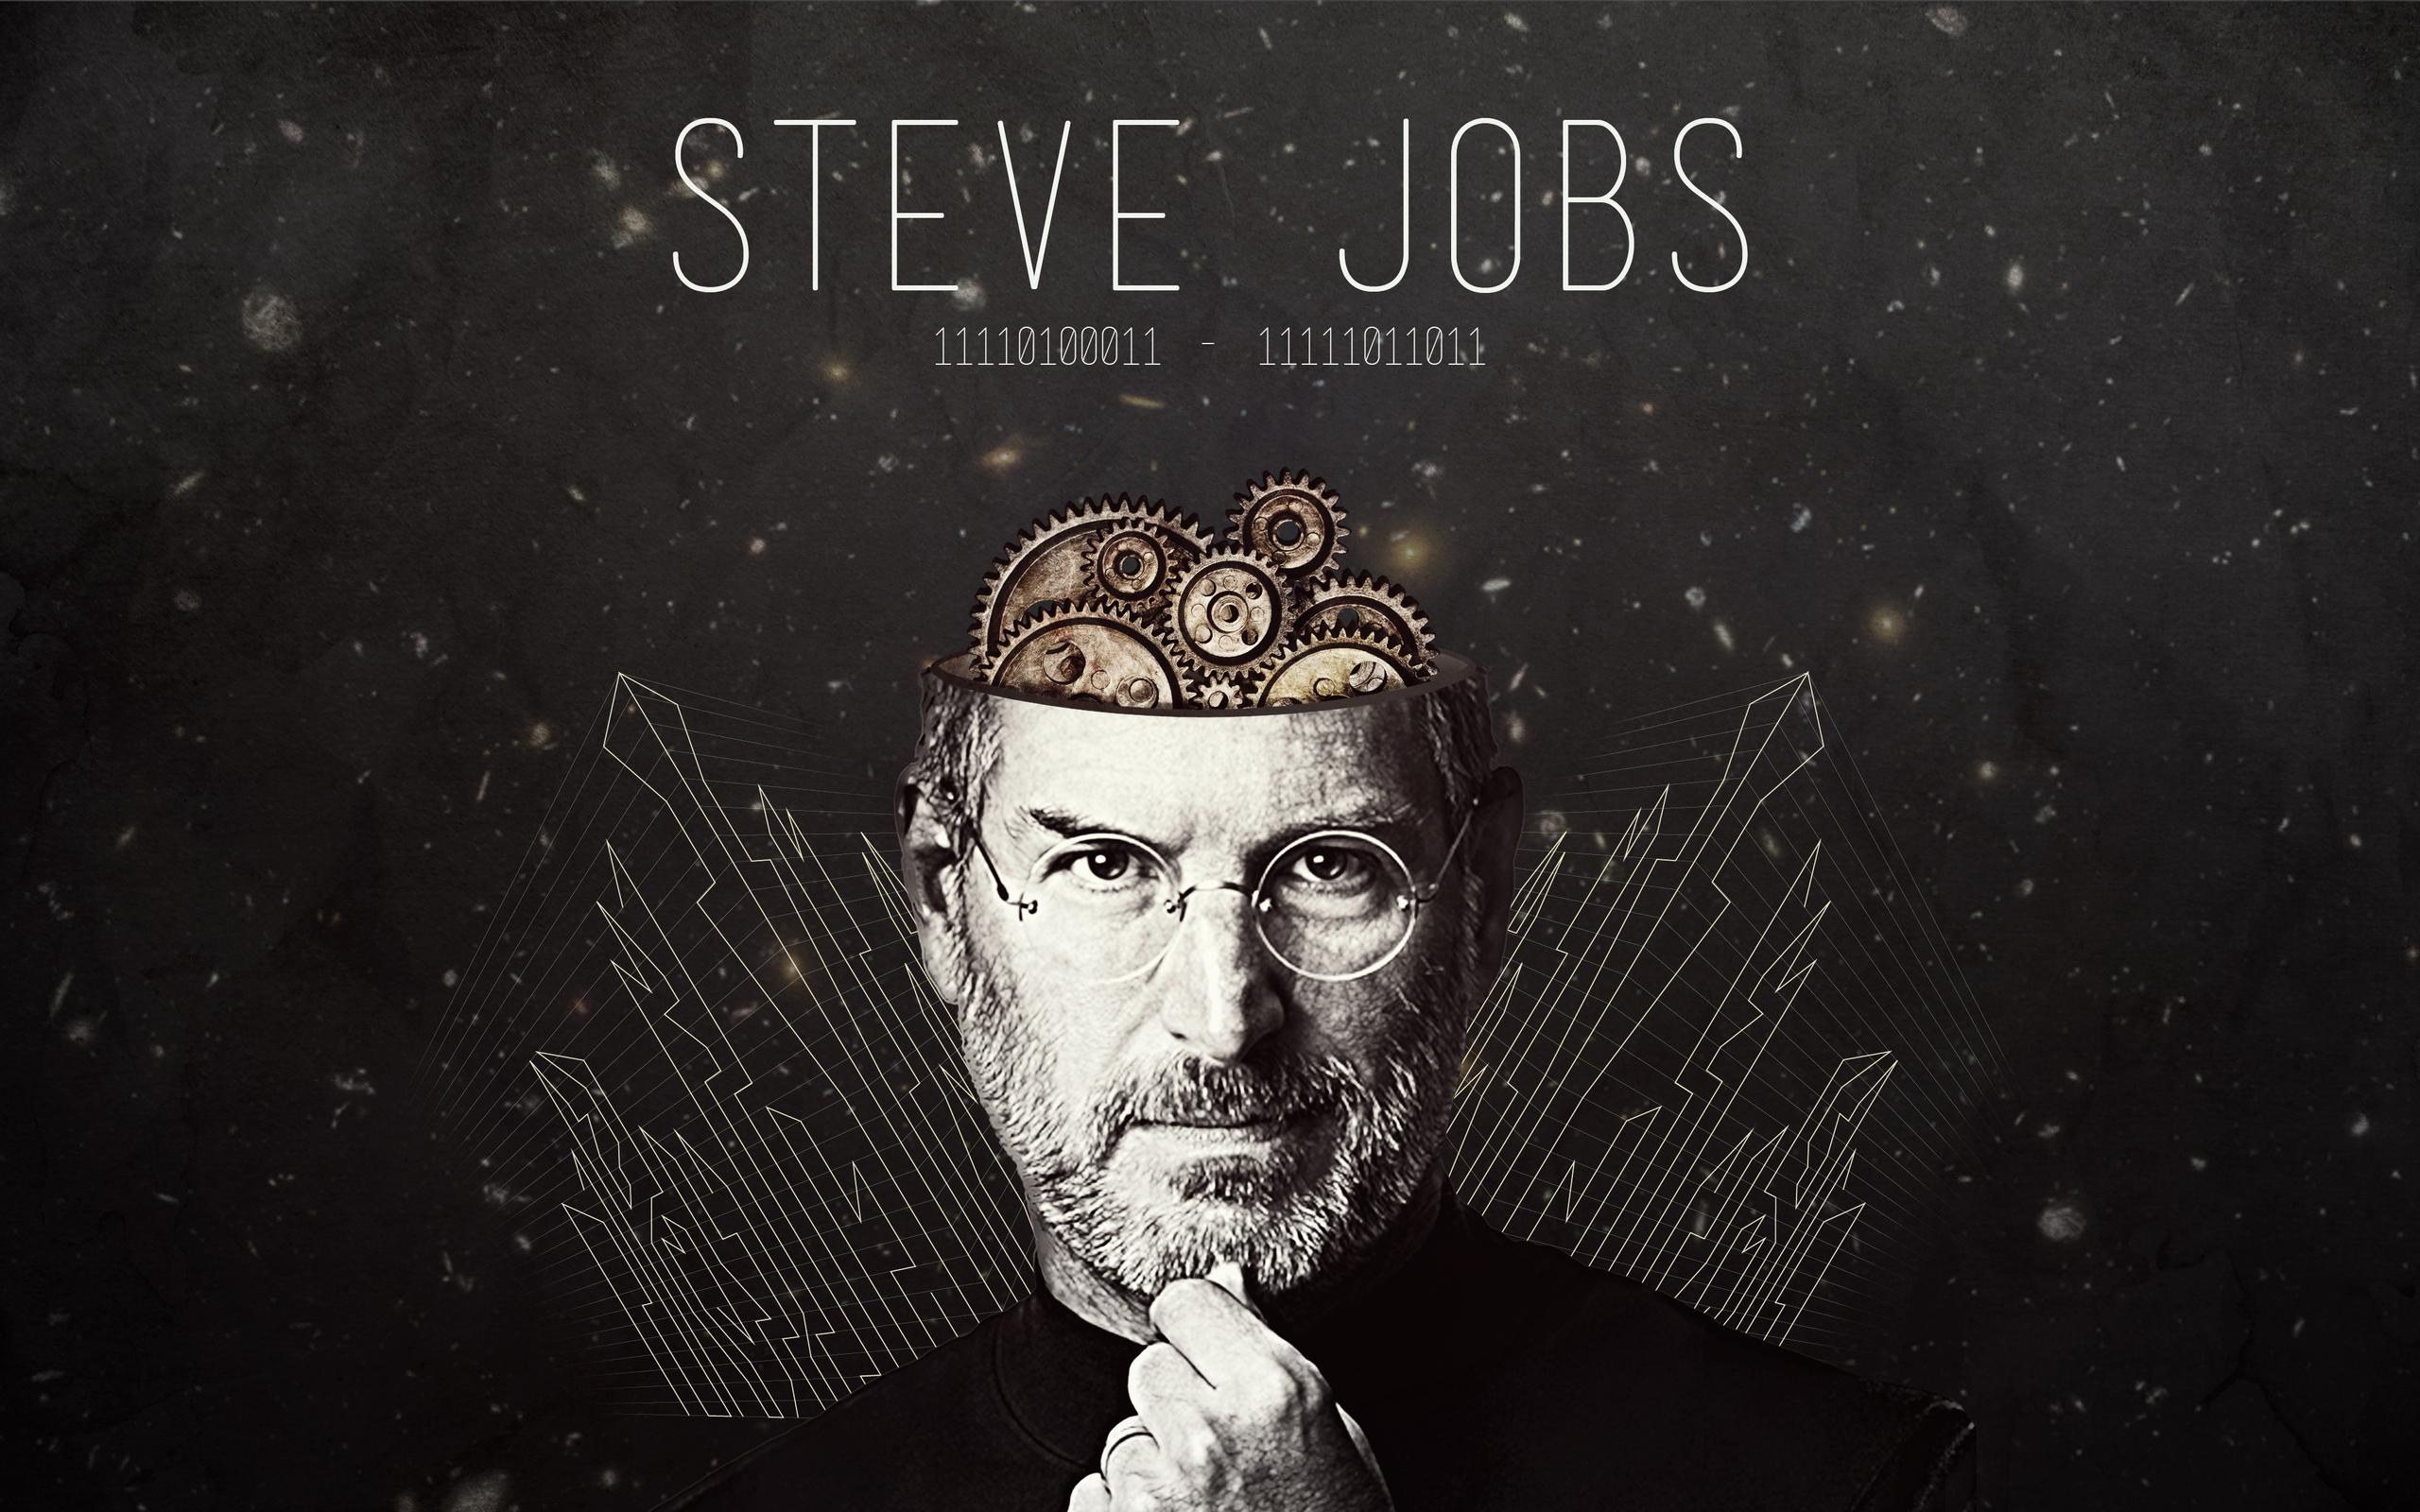 Steve jobs hd typography 4k wallpapers images - Steve jobs wallpaper download ...